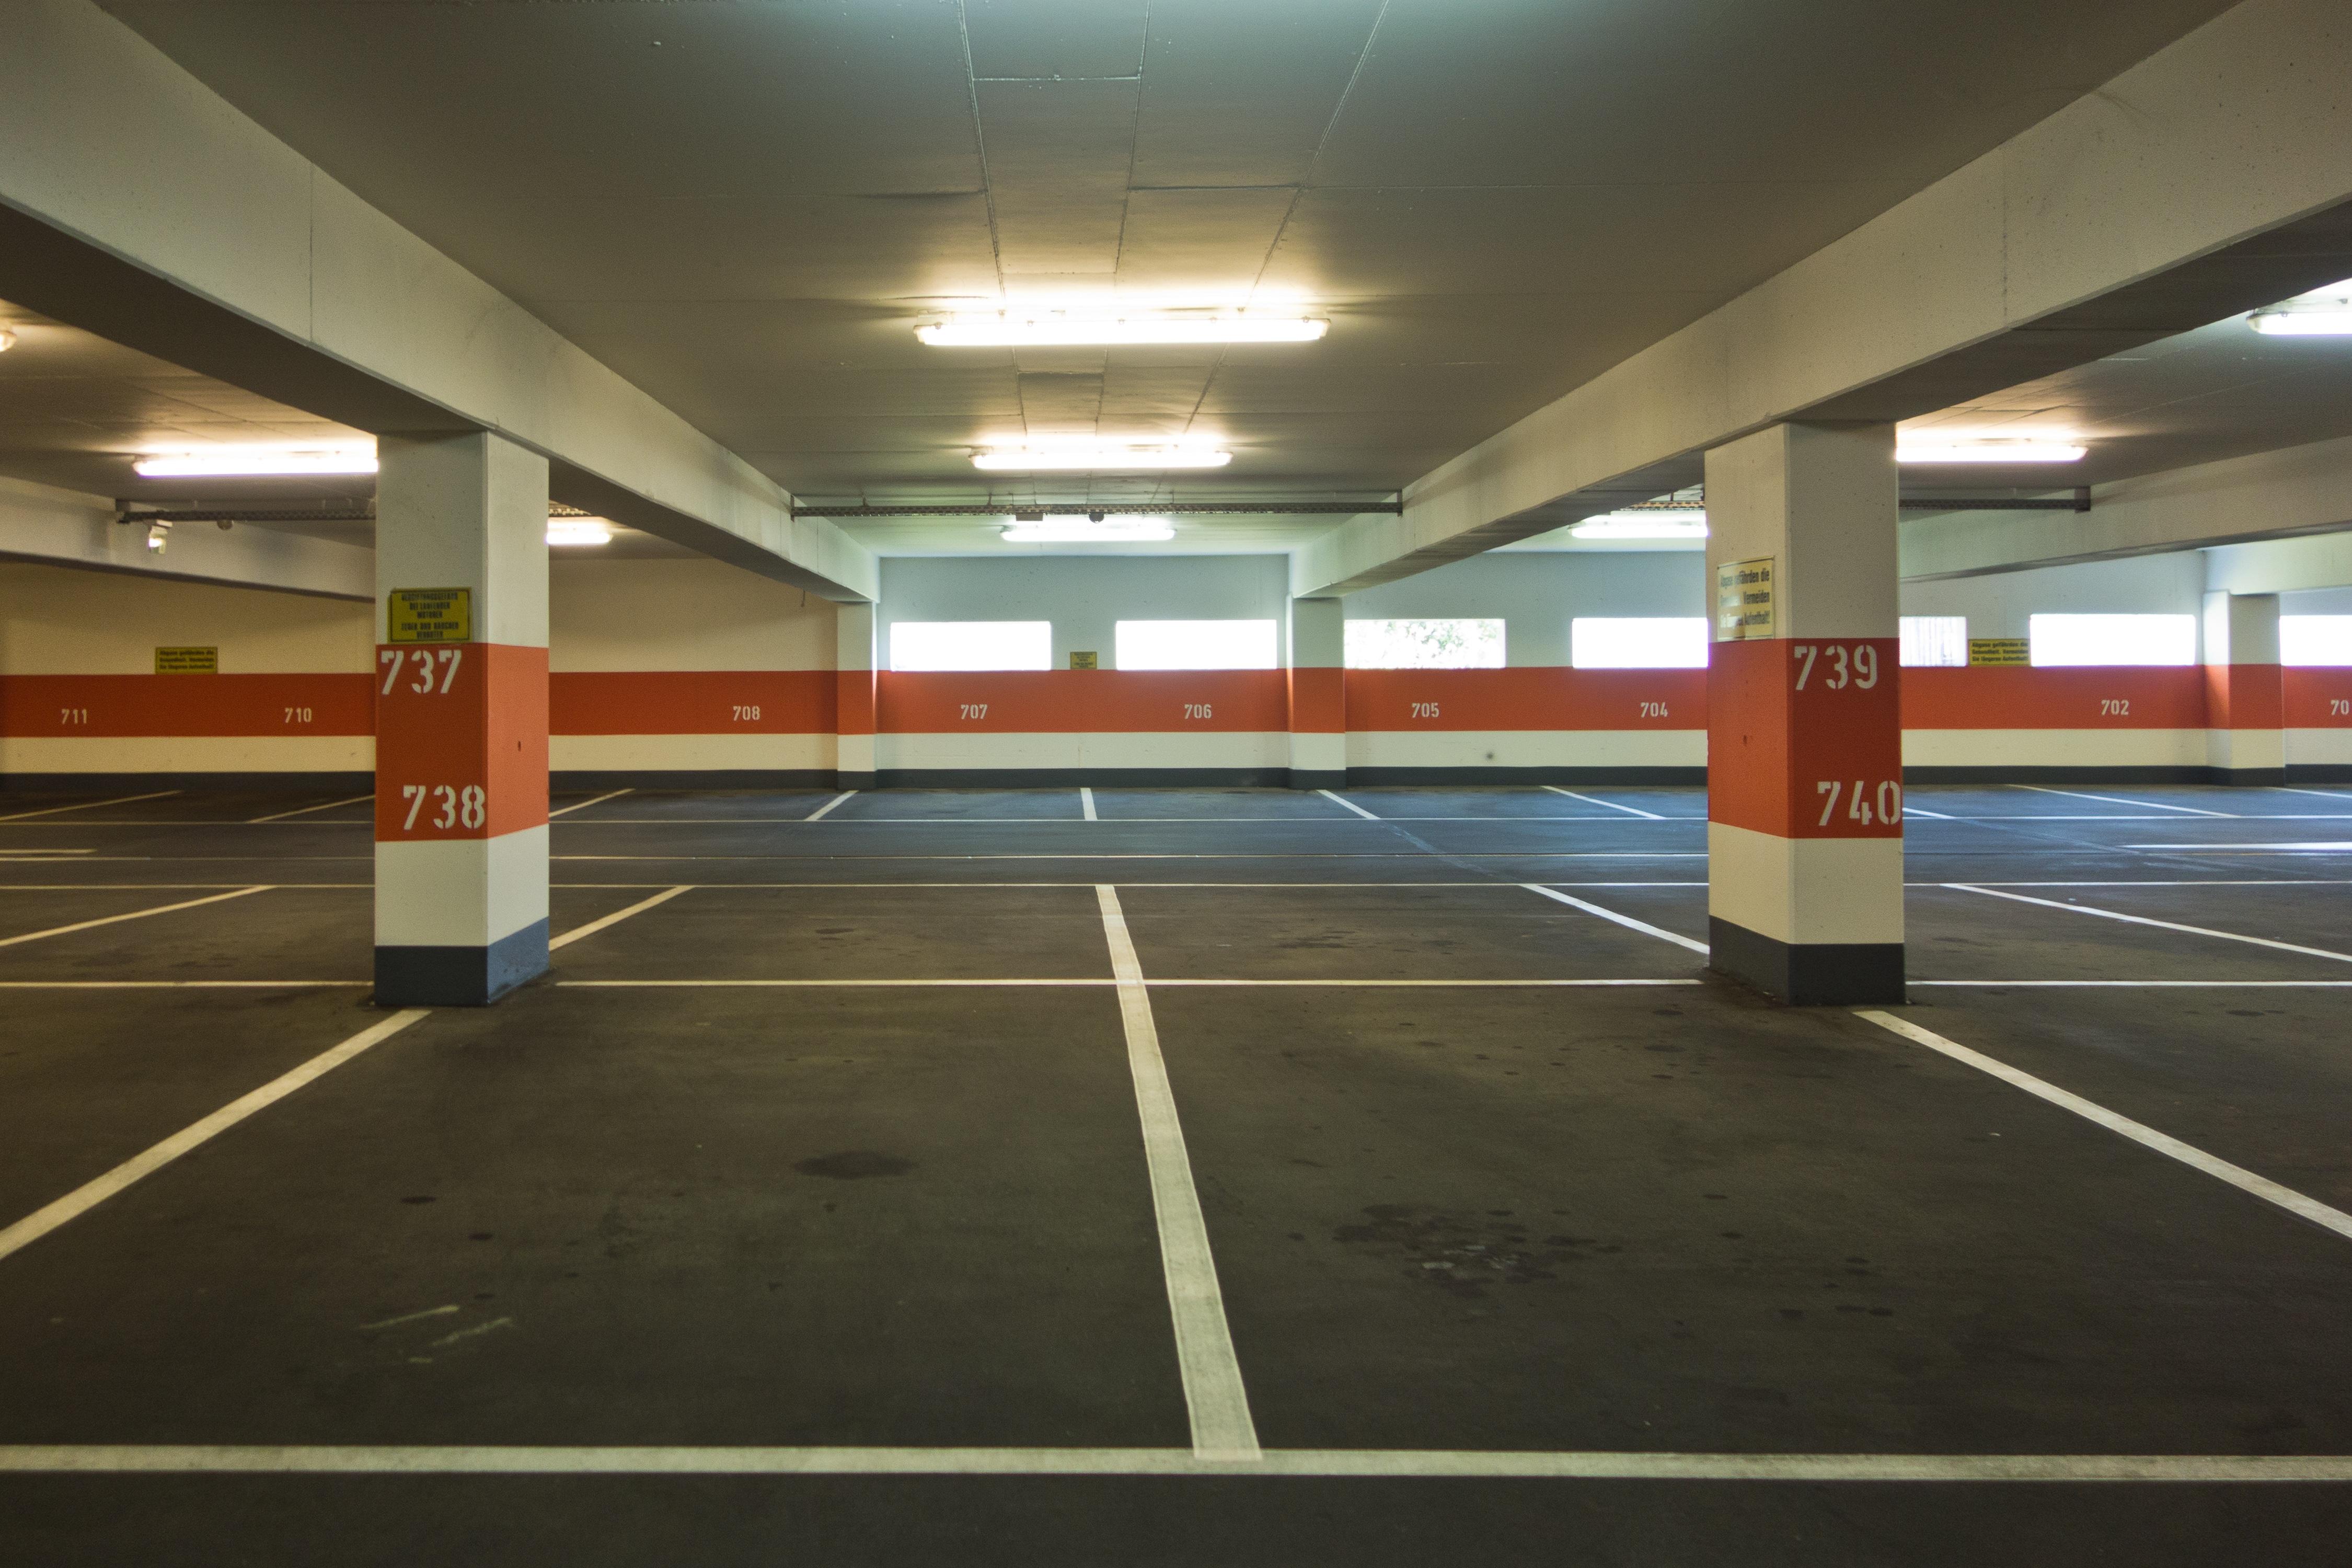 Gambar struktur jumlah kereta bawah tanah kosong for Flying spaces schweiz